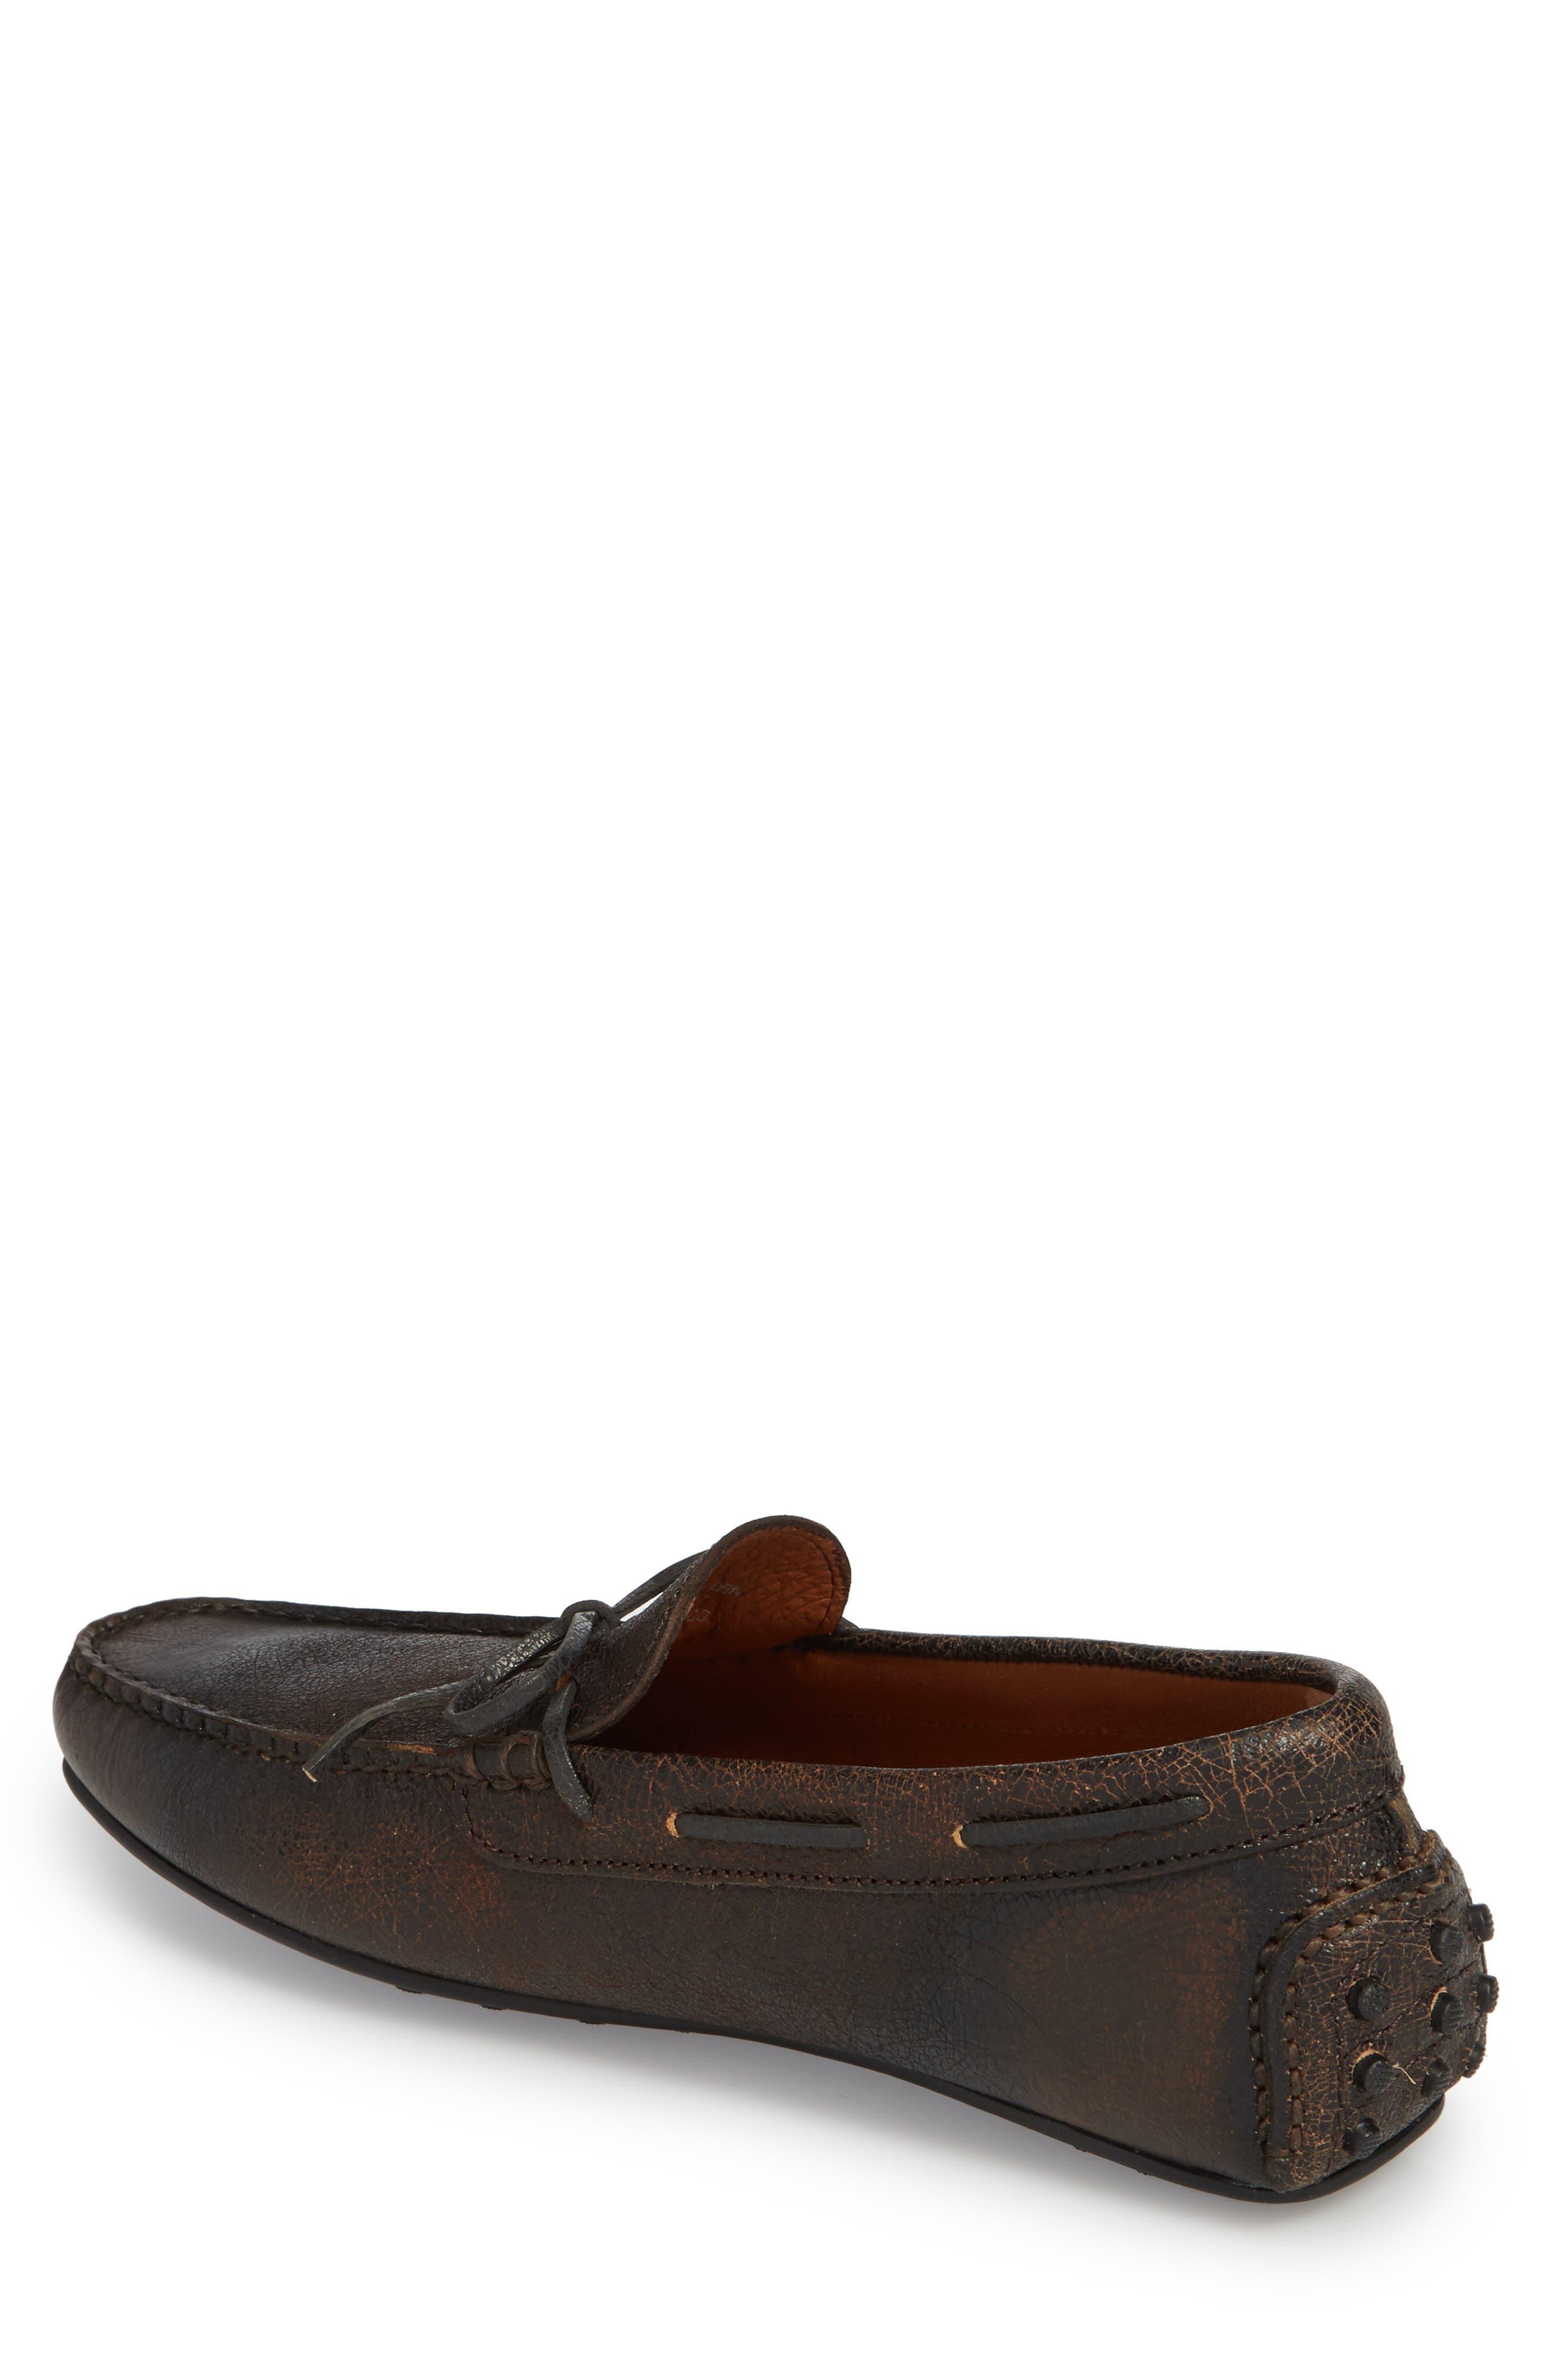 Allen Loafer,                             Alternate thumbnail 2, color,                             Dark Brown Leather